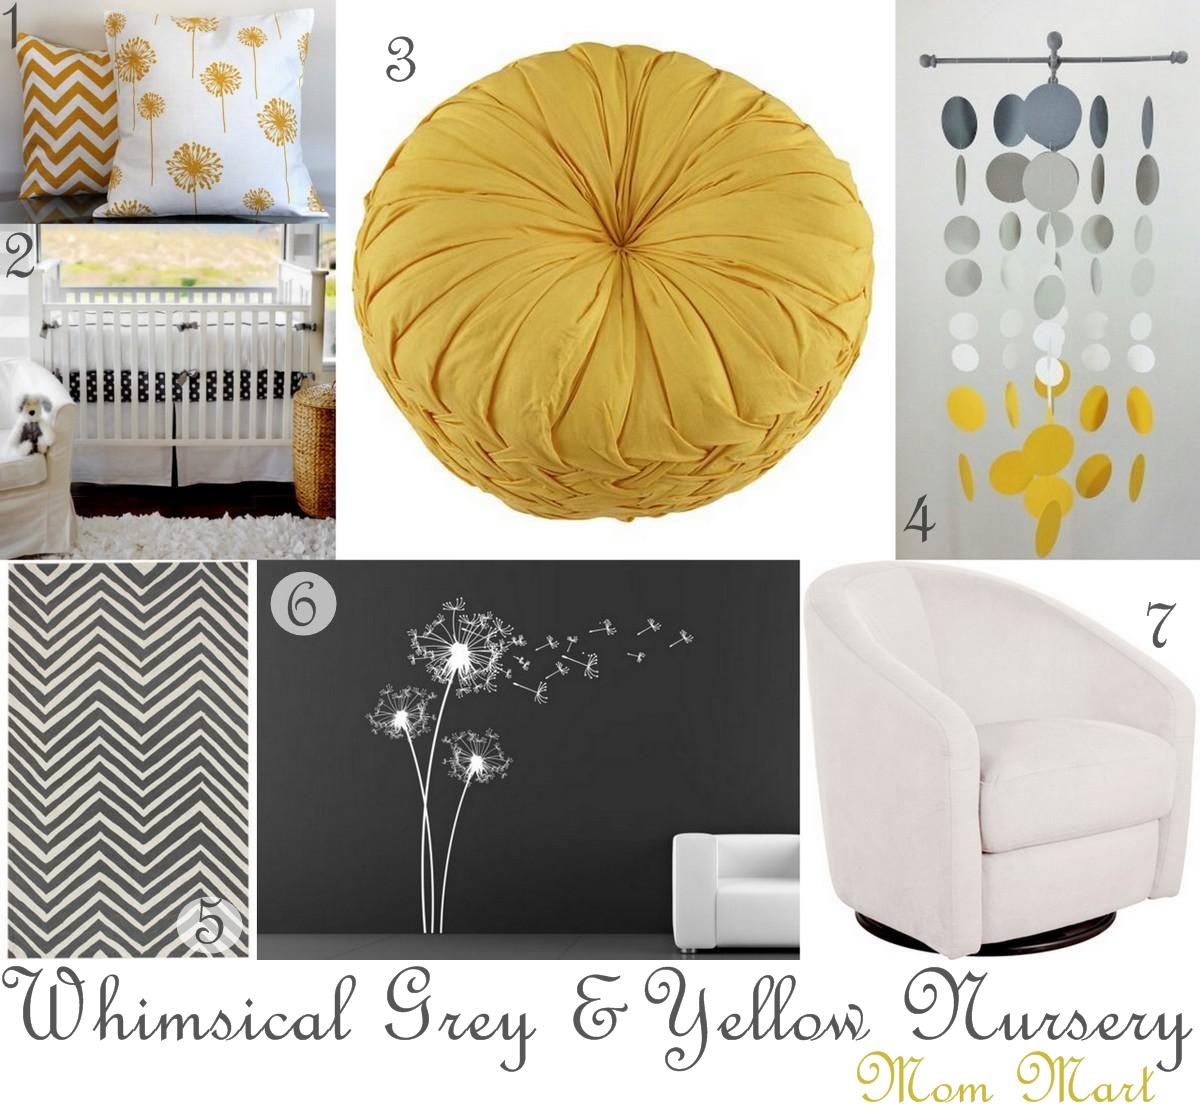 Whimsical Grey And Yellow Dandelion Nursery